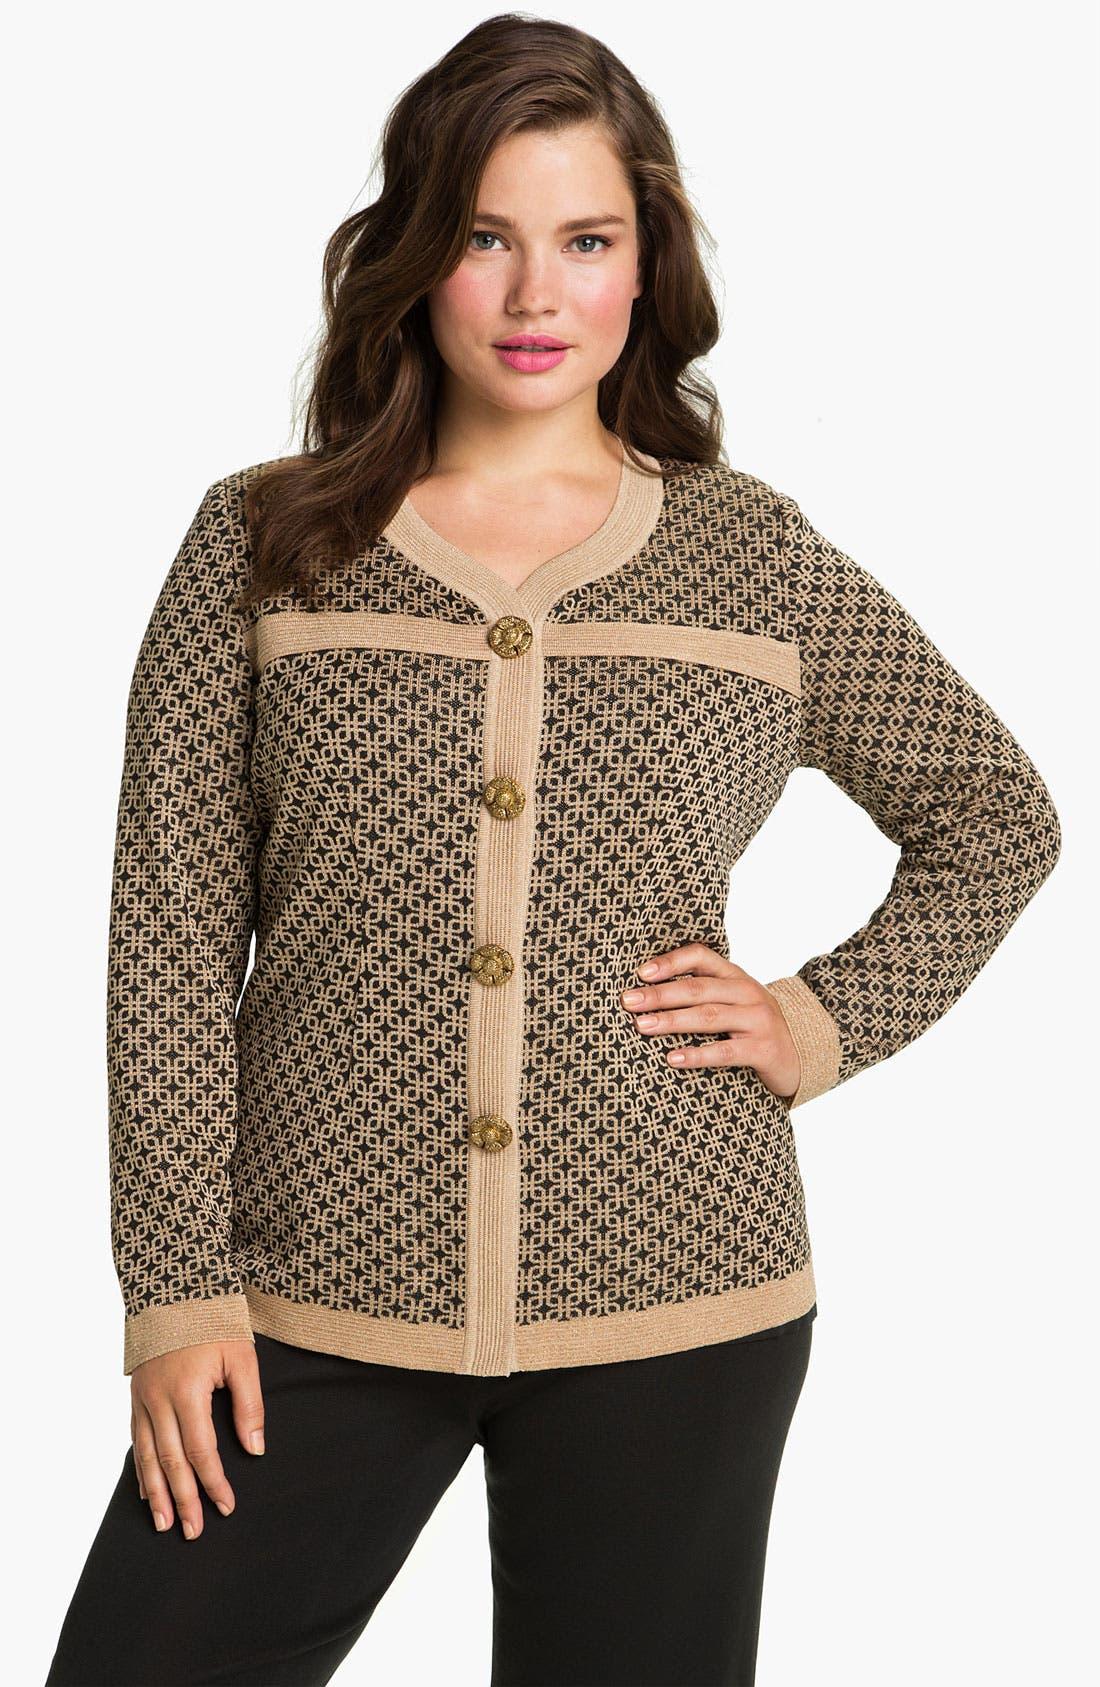 Alternate Image 1 Selected - Exclusively Misook Tweed Knit Jacket (Plus)